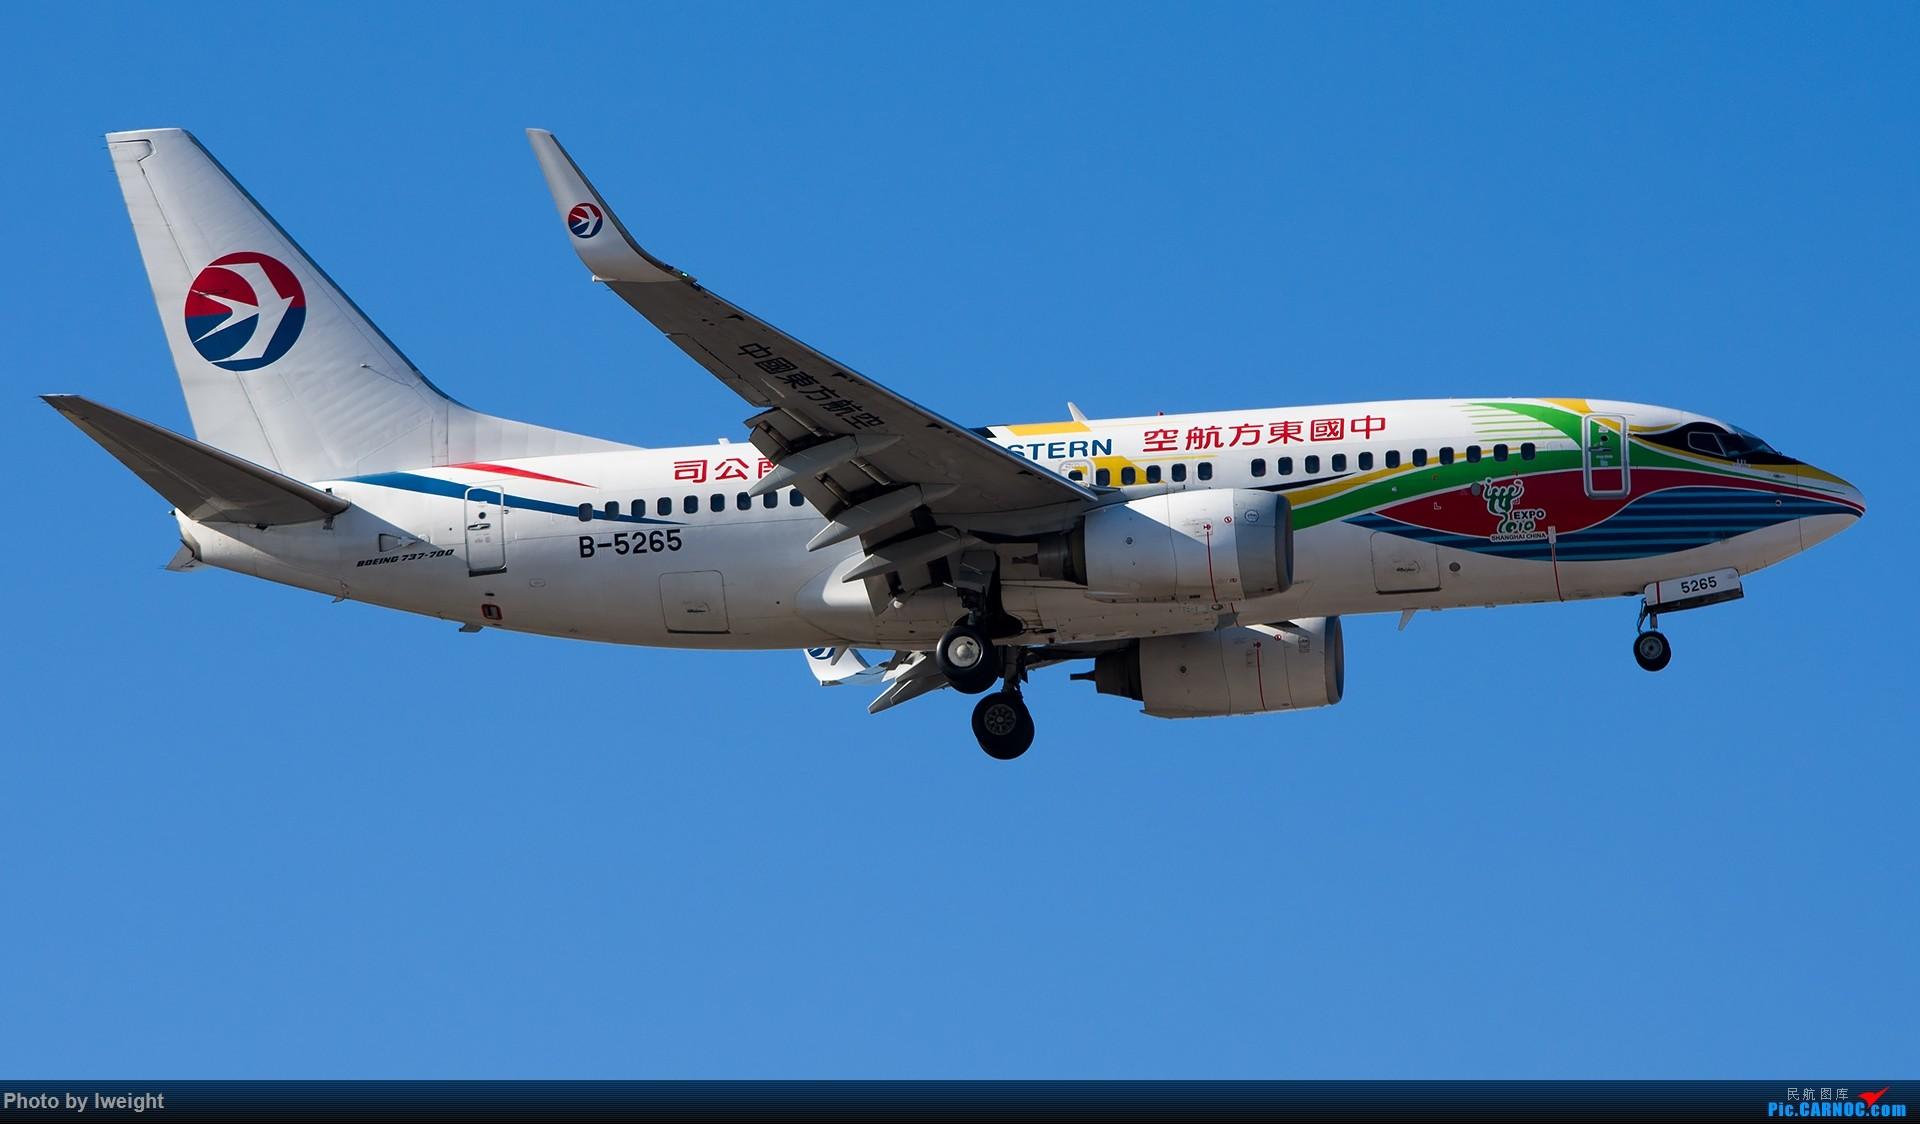 Re:[原创]终于在12月的北京等到了一个晴天的周末,出来拍拍飞机【2015-12-5】 BOEING 737-700 B-5265 中国北京首都国际机场